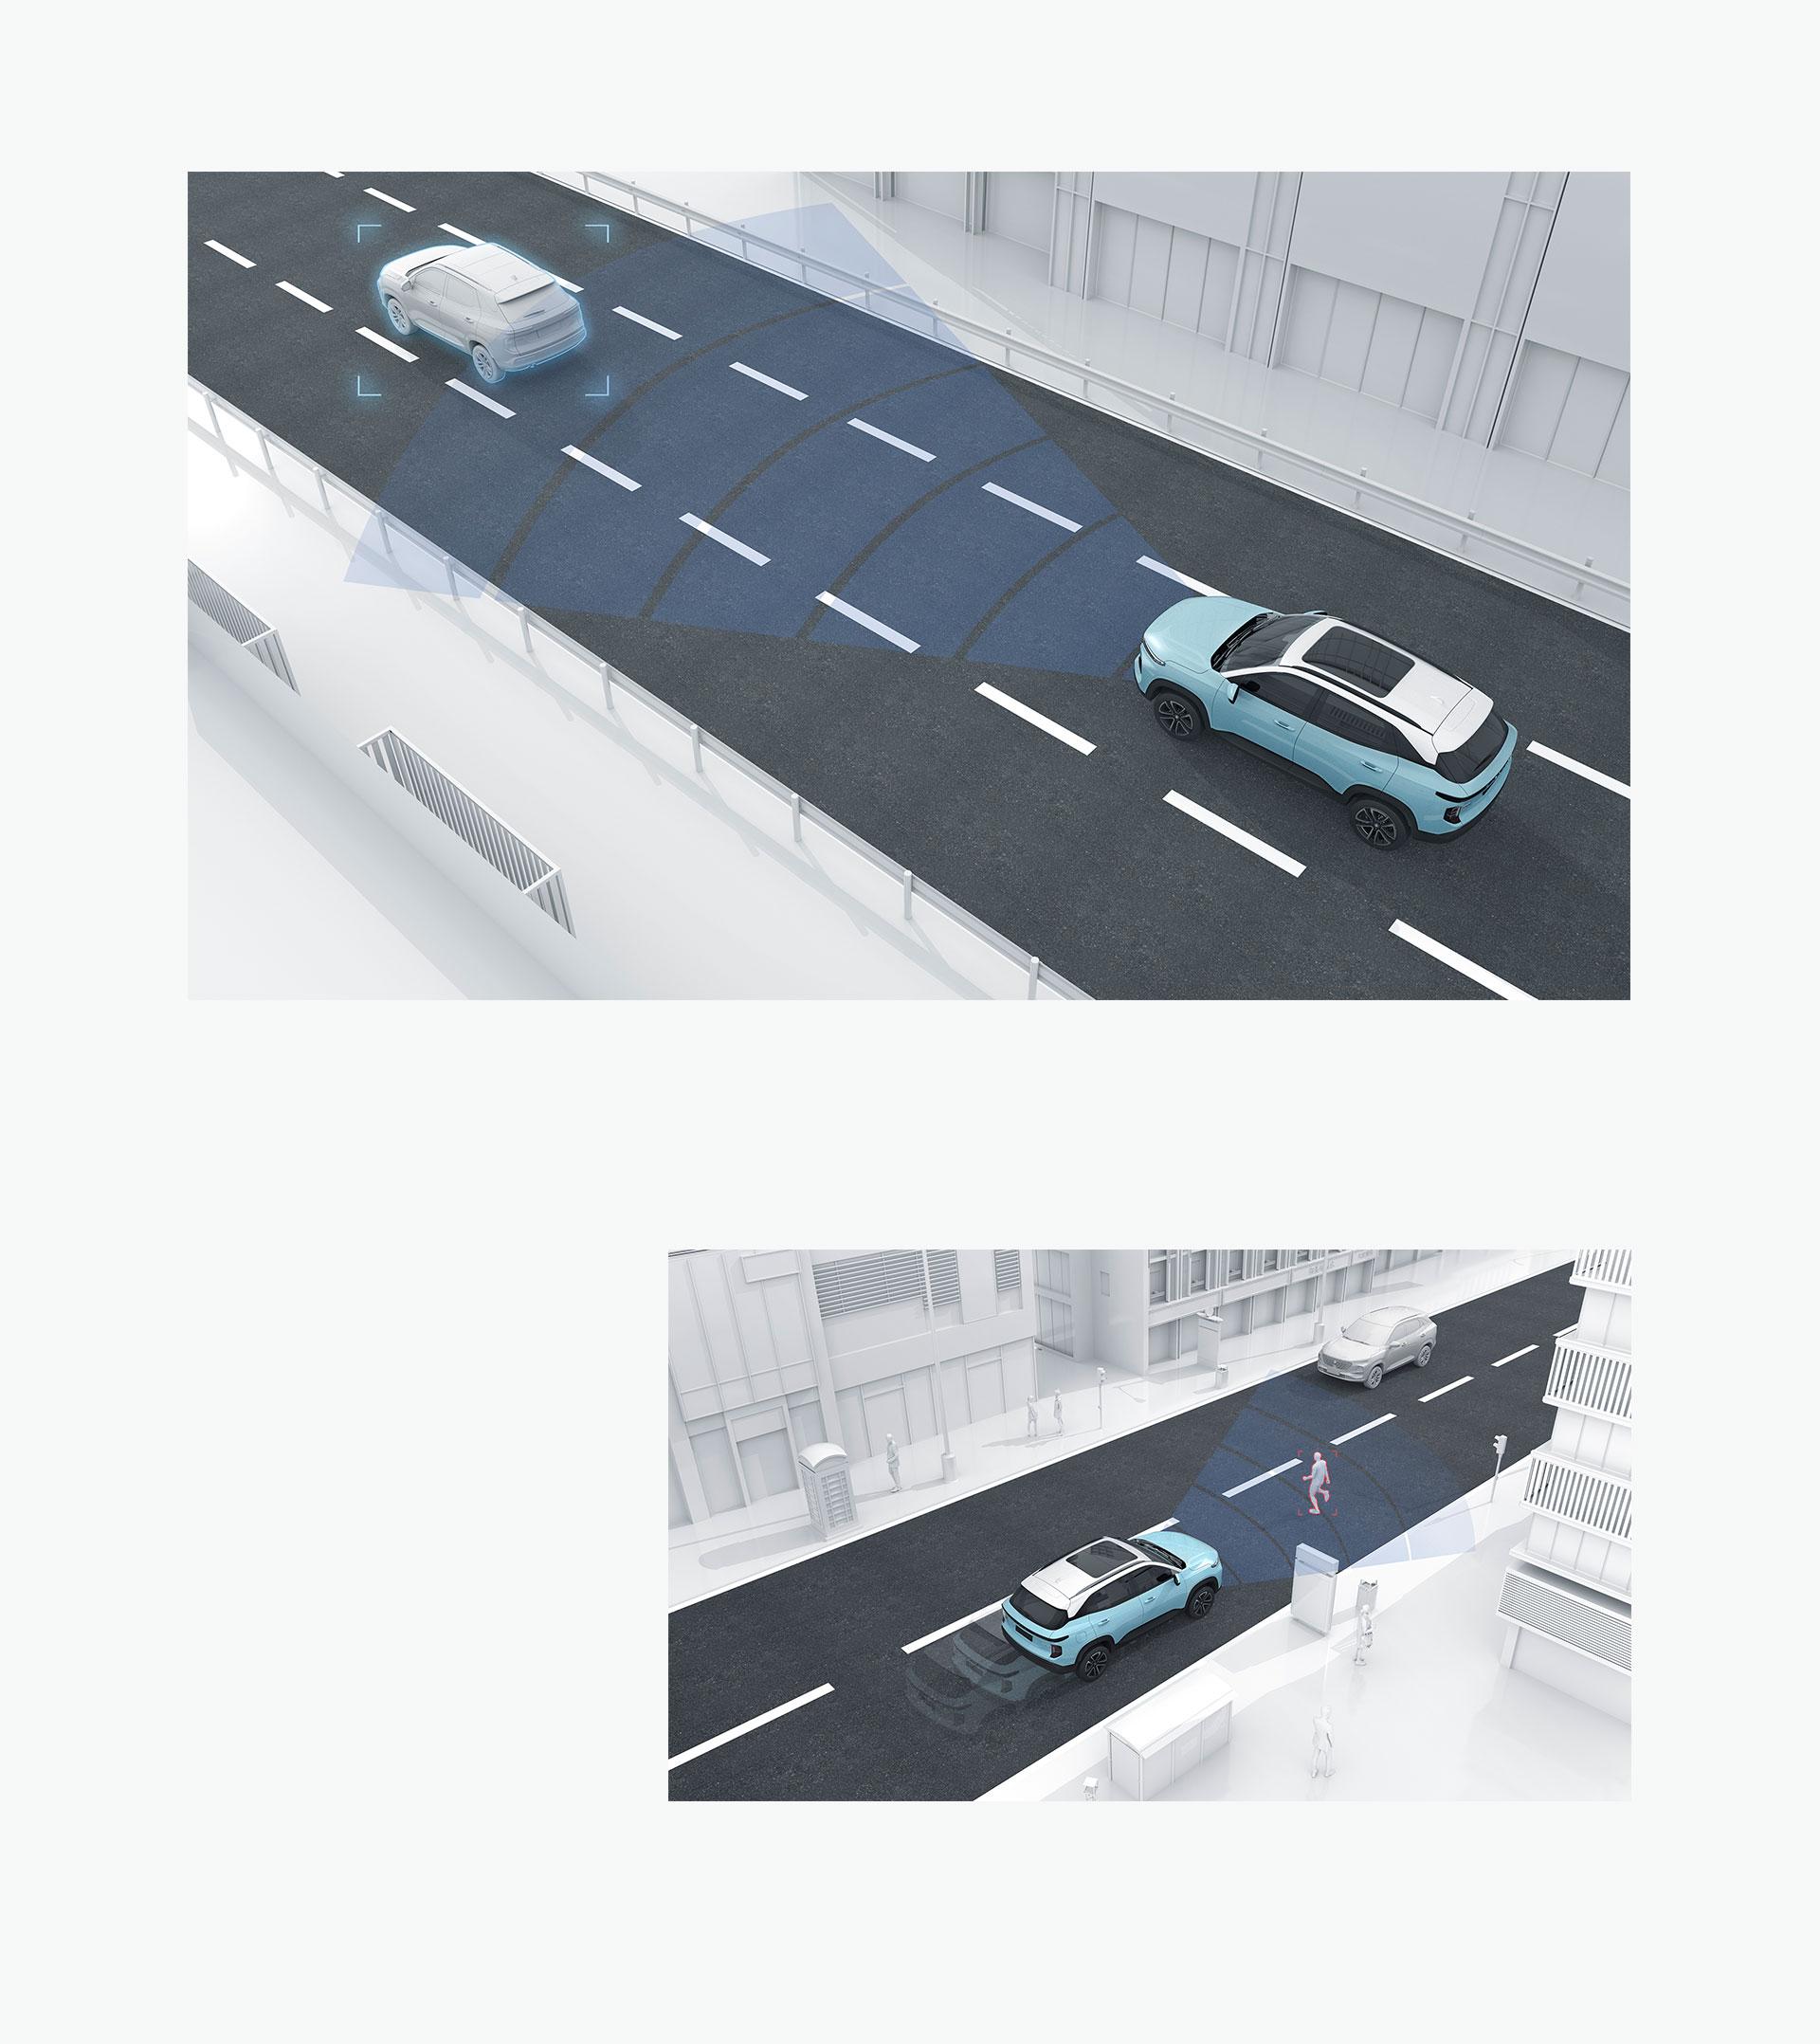 新寶駿RS-3,寶駿RS-3,寶駿RS3,智(zhi)能SUV,自yuan) 菔桓fu)助,自適應巡(xun)航(hang),主(zhu)動安全配(pei)置(zhi)